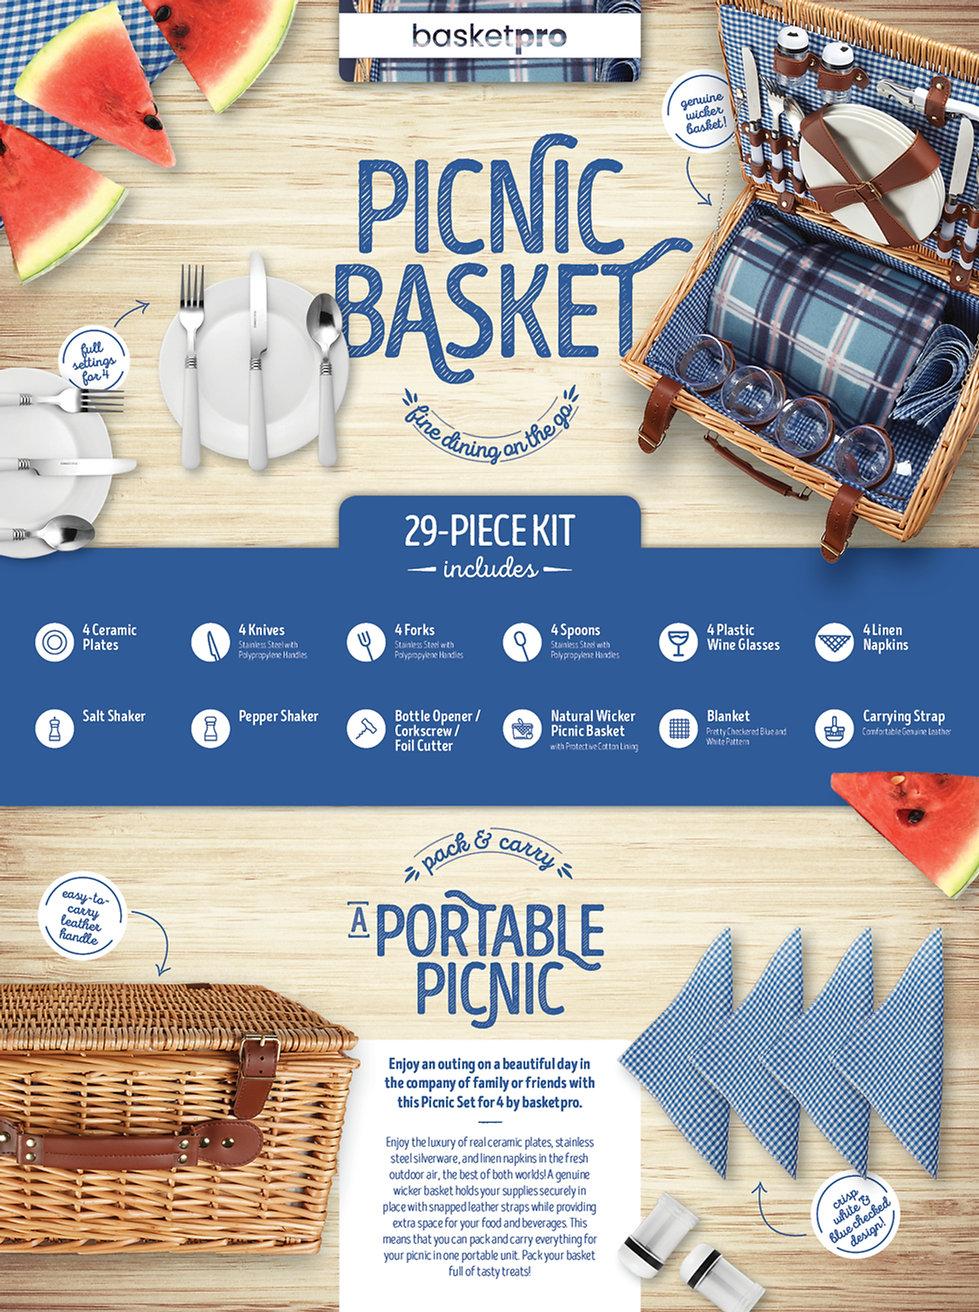 new picnic basket.jpg